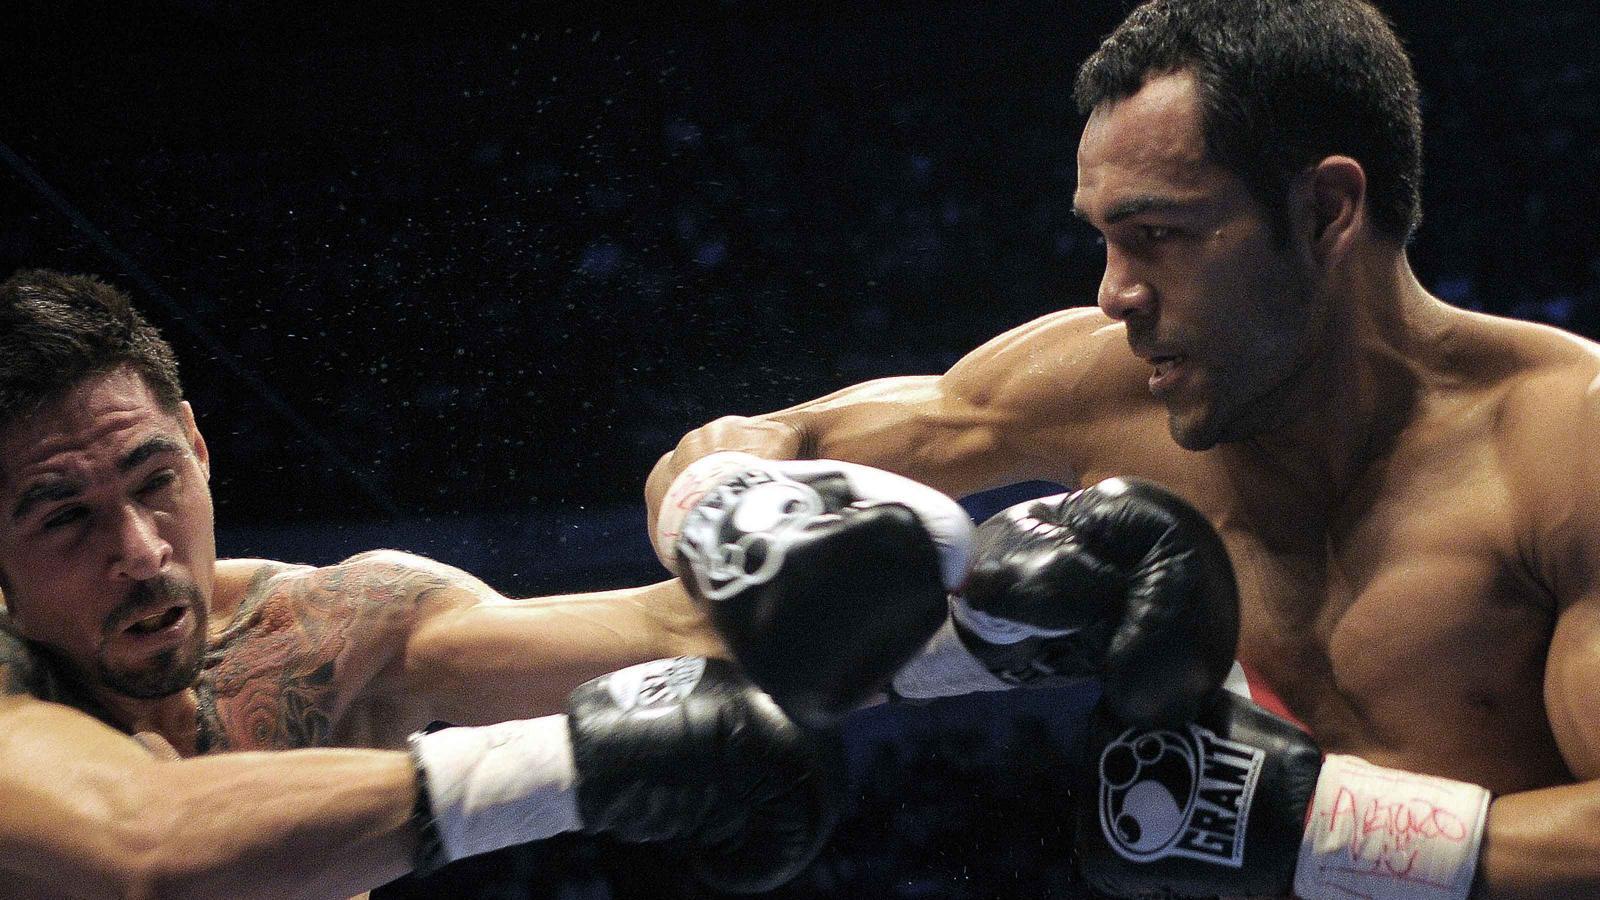 grant boxing mexico